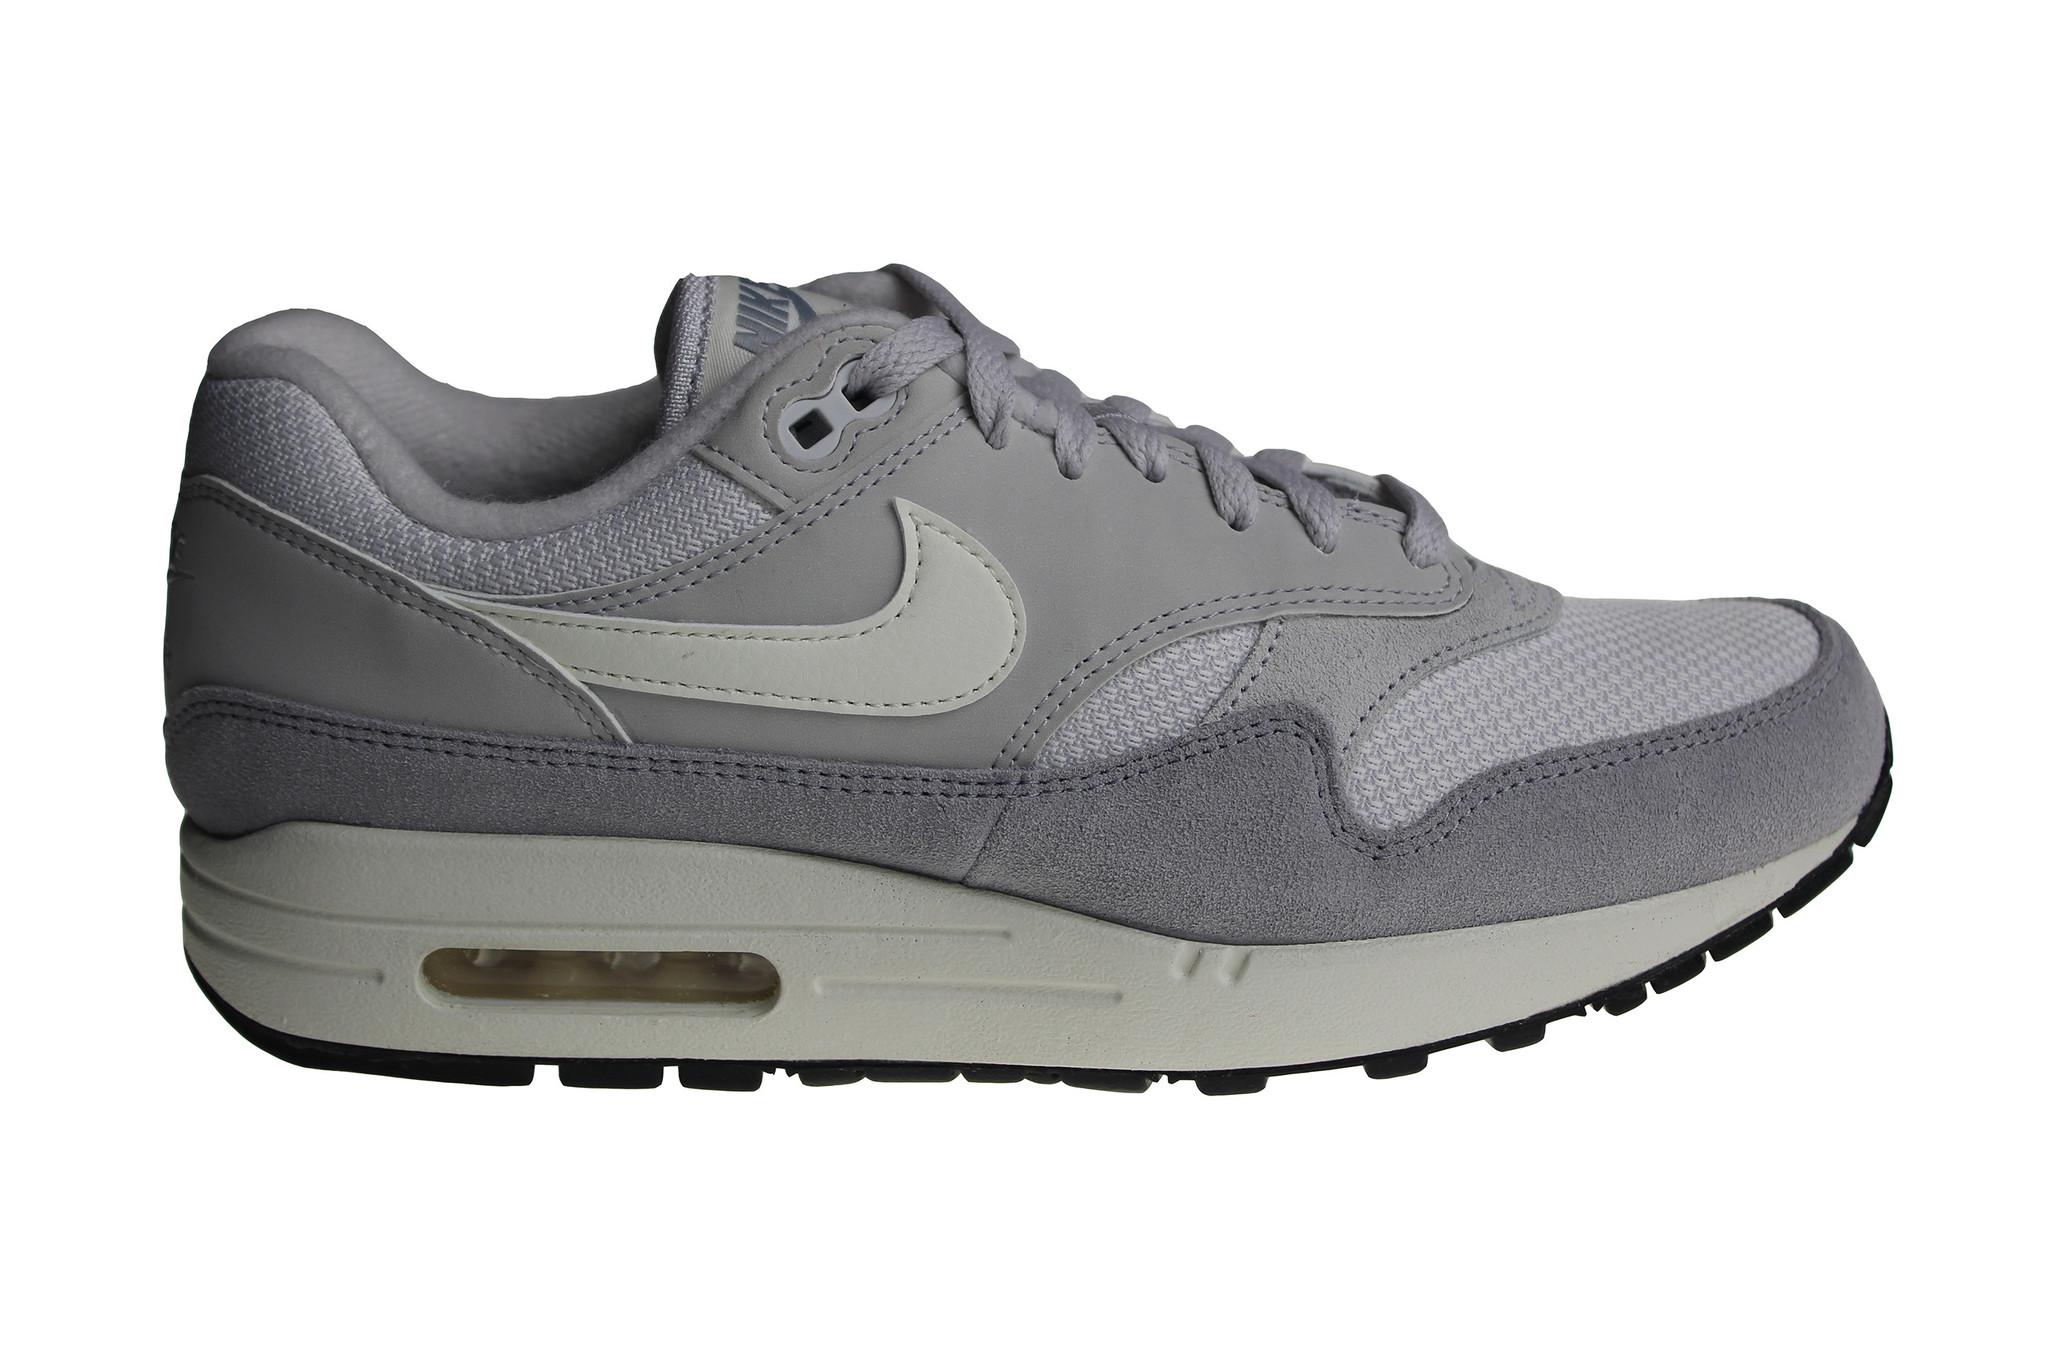 Nike Air Max 1 GreyWhite AH8145 011 Men's